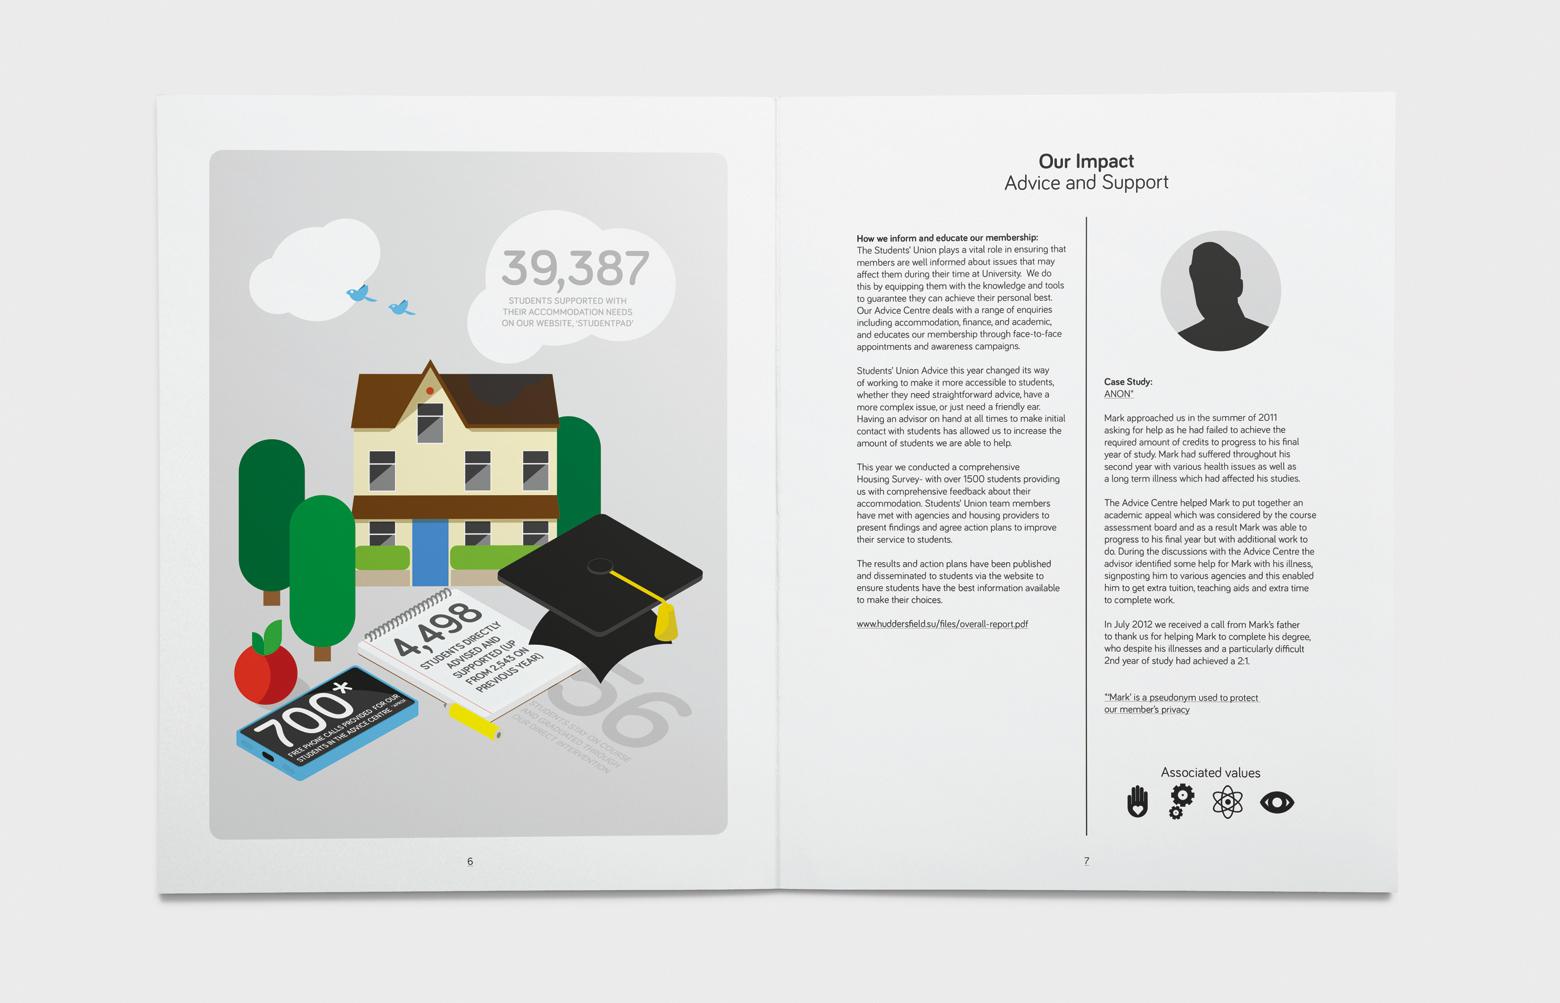 AND-Studio-Huddersfield-StudentsUnion-ImpactReport-Book-Spread-1